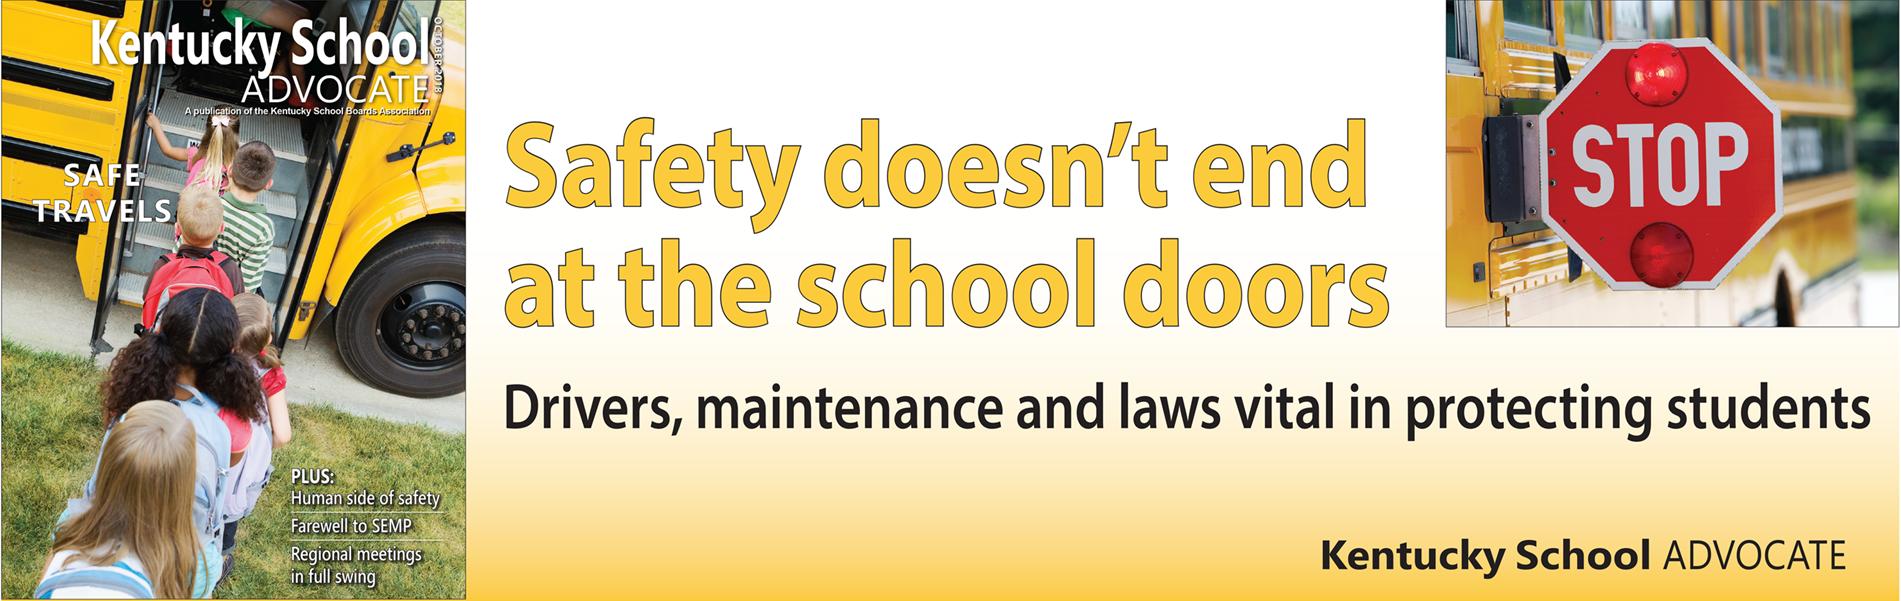 http://www.ksba.org/Schoolbussafety.aspx